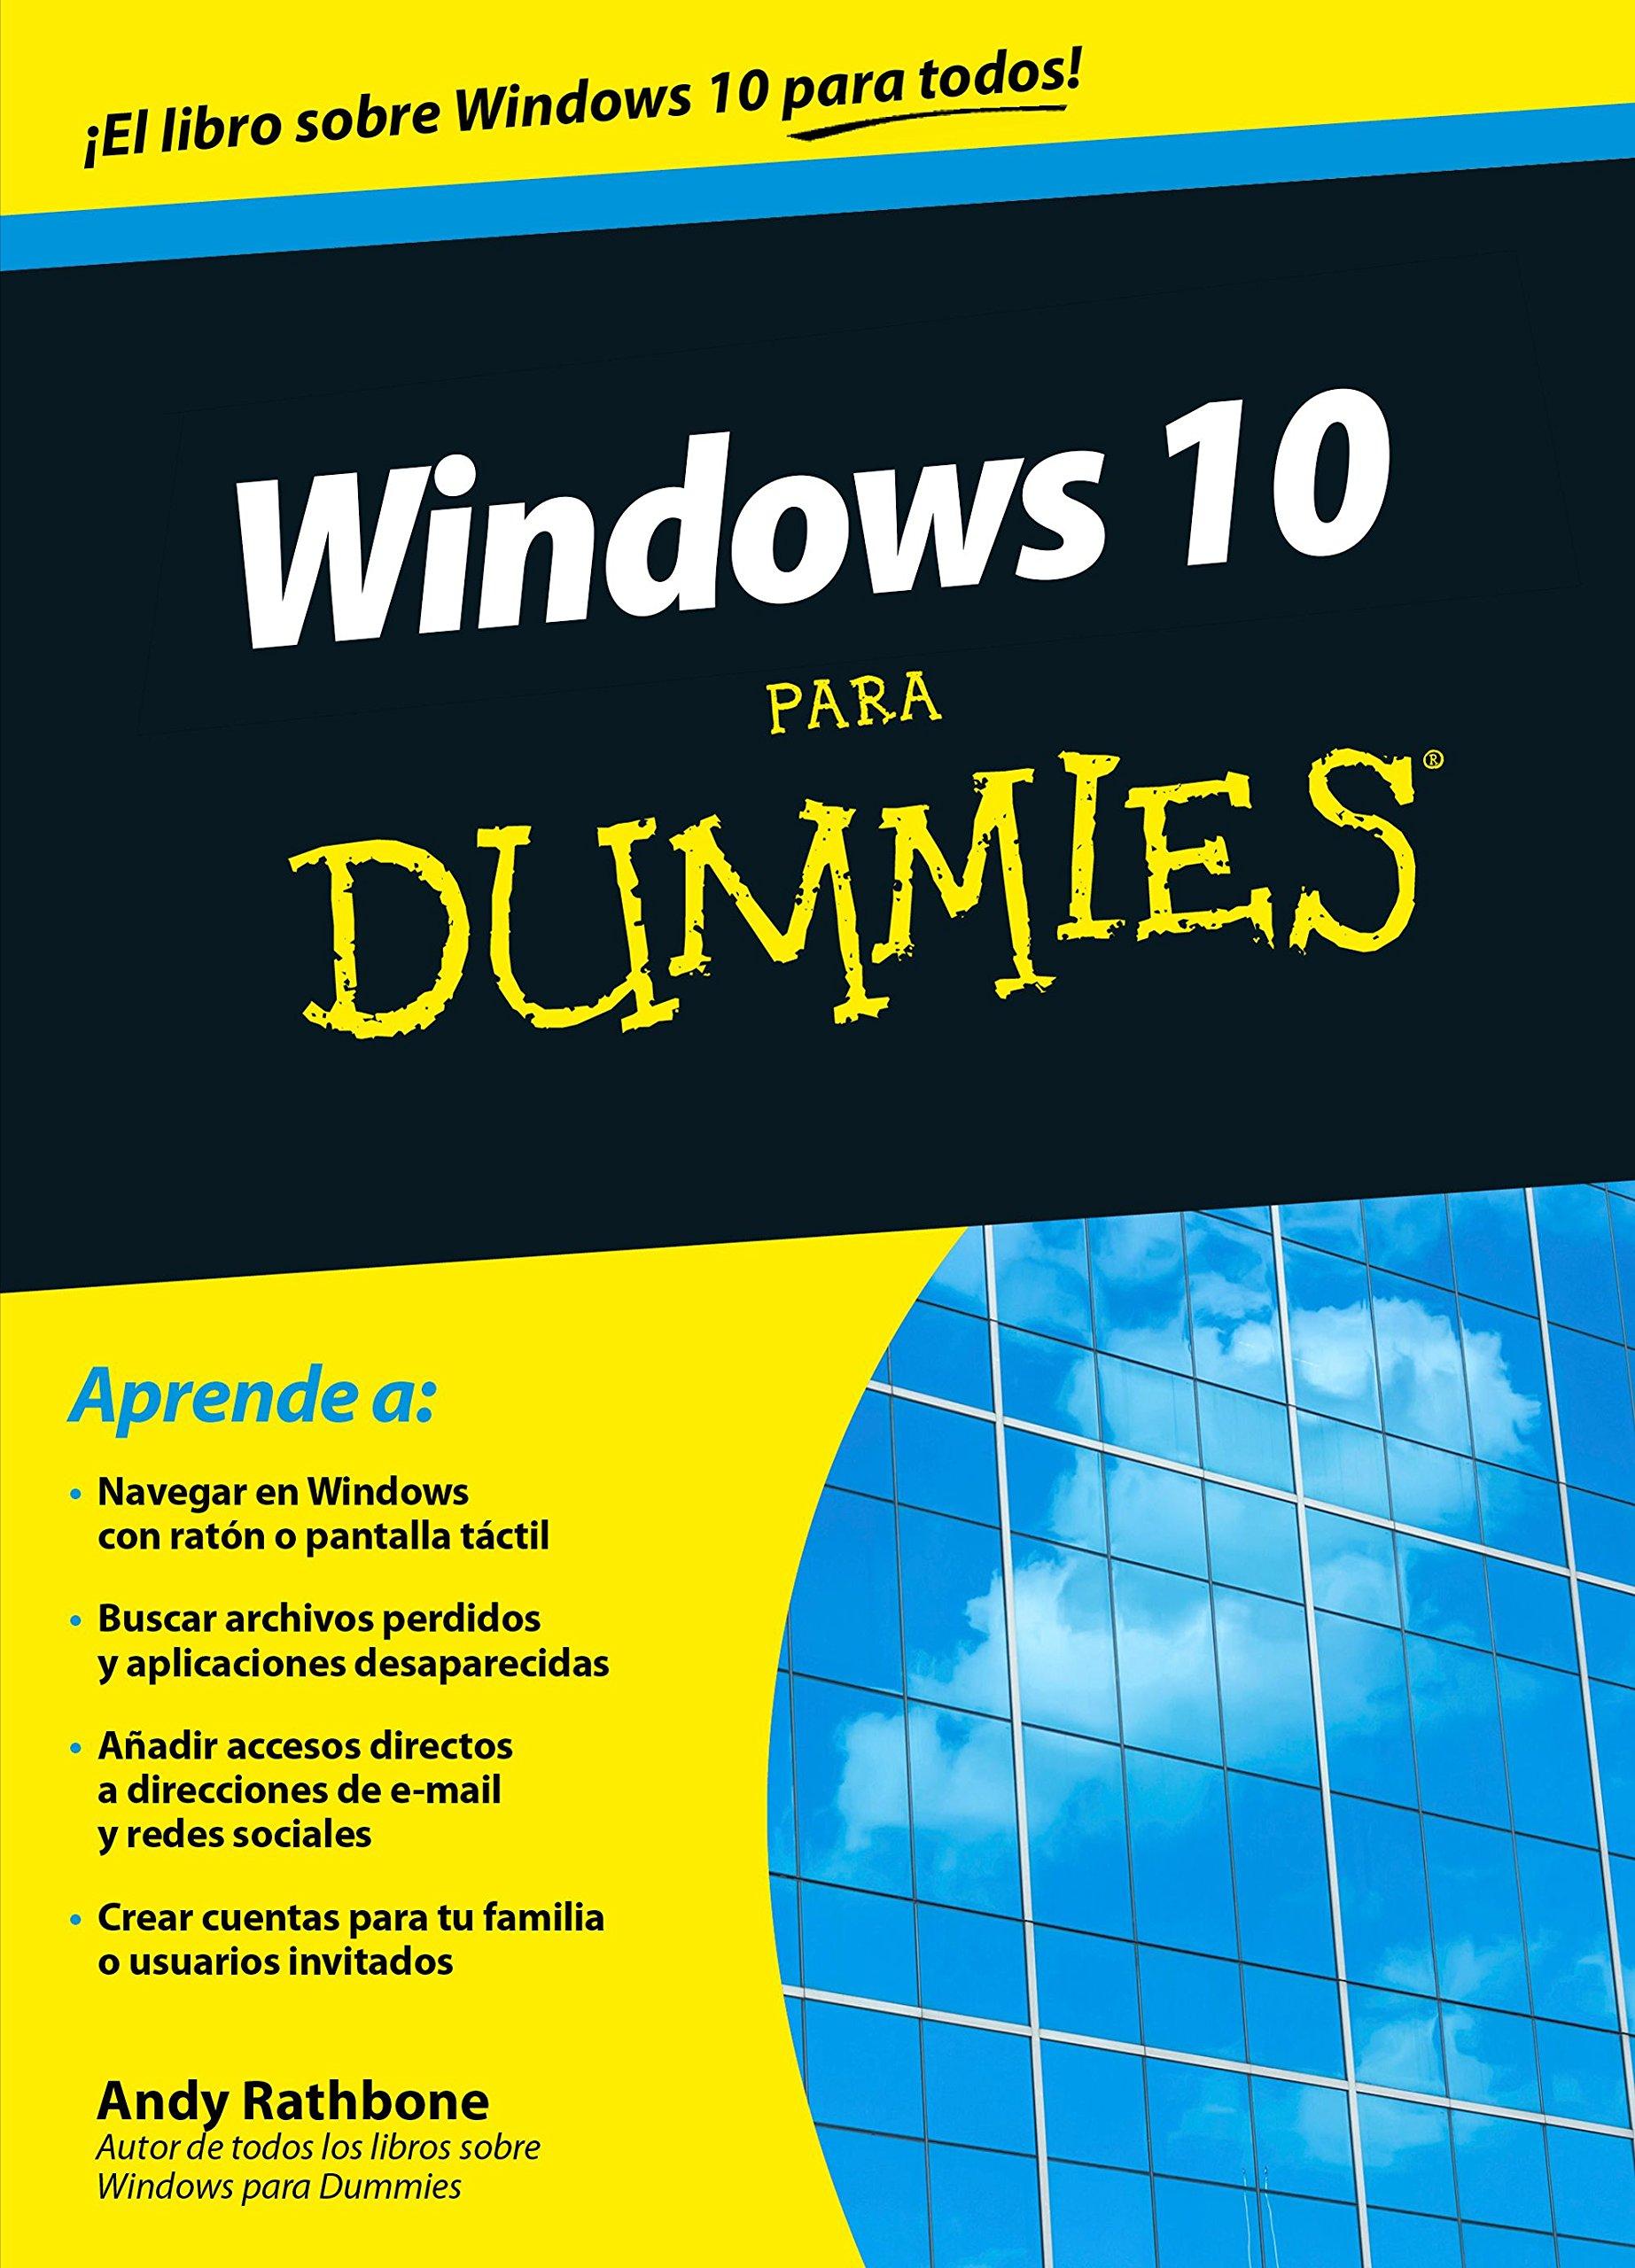 Windows 10 para Dummies Tapa blanda – 14 oct 2015 Andy Rathbone Paola Tormo Eugenia Arrés Natalia Montoro